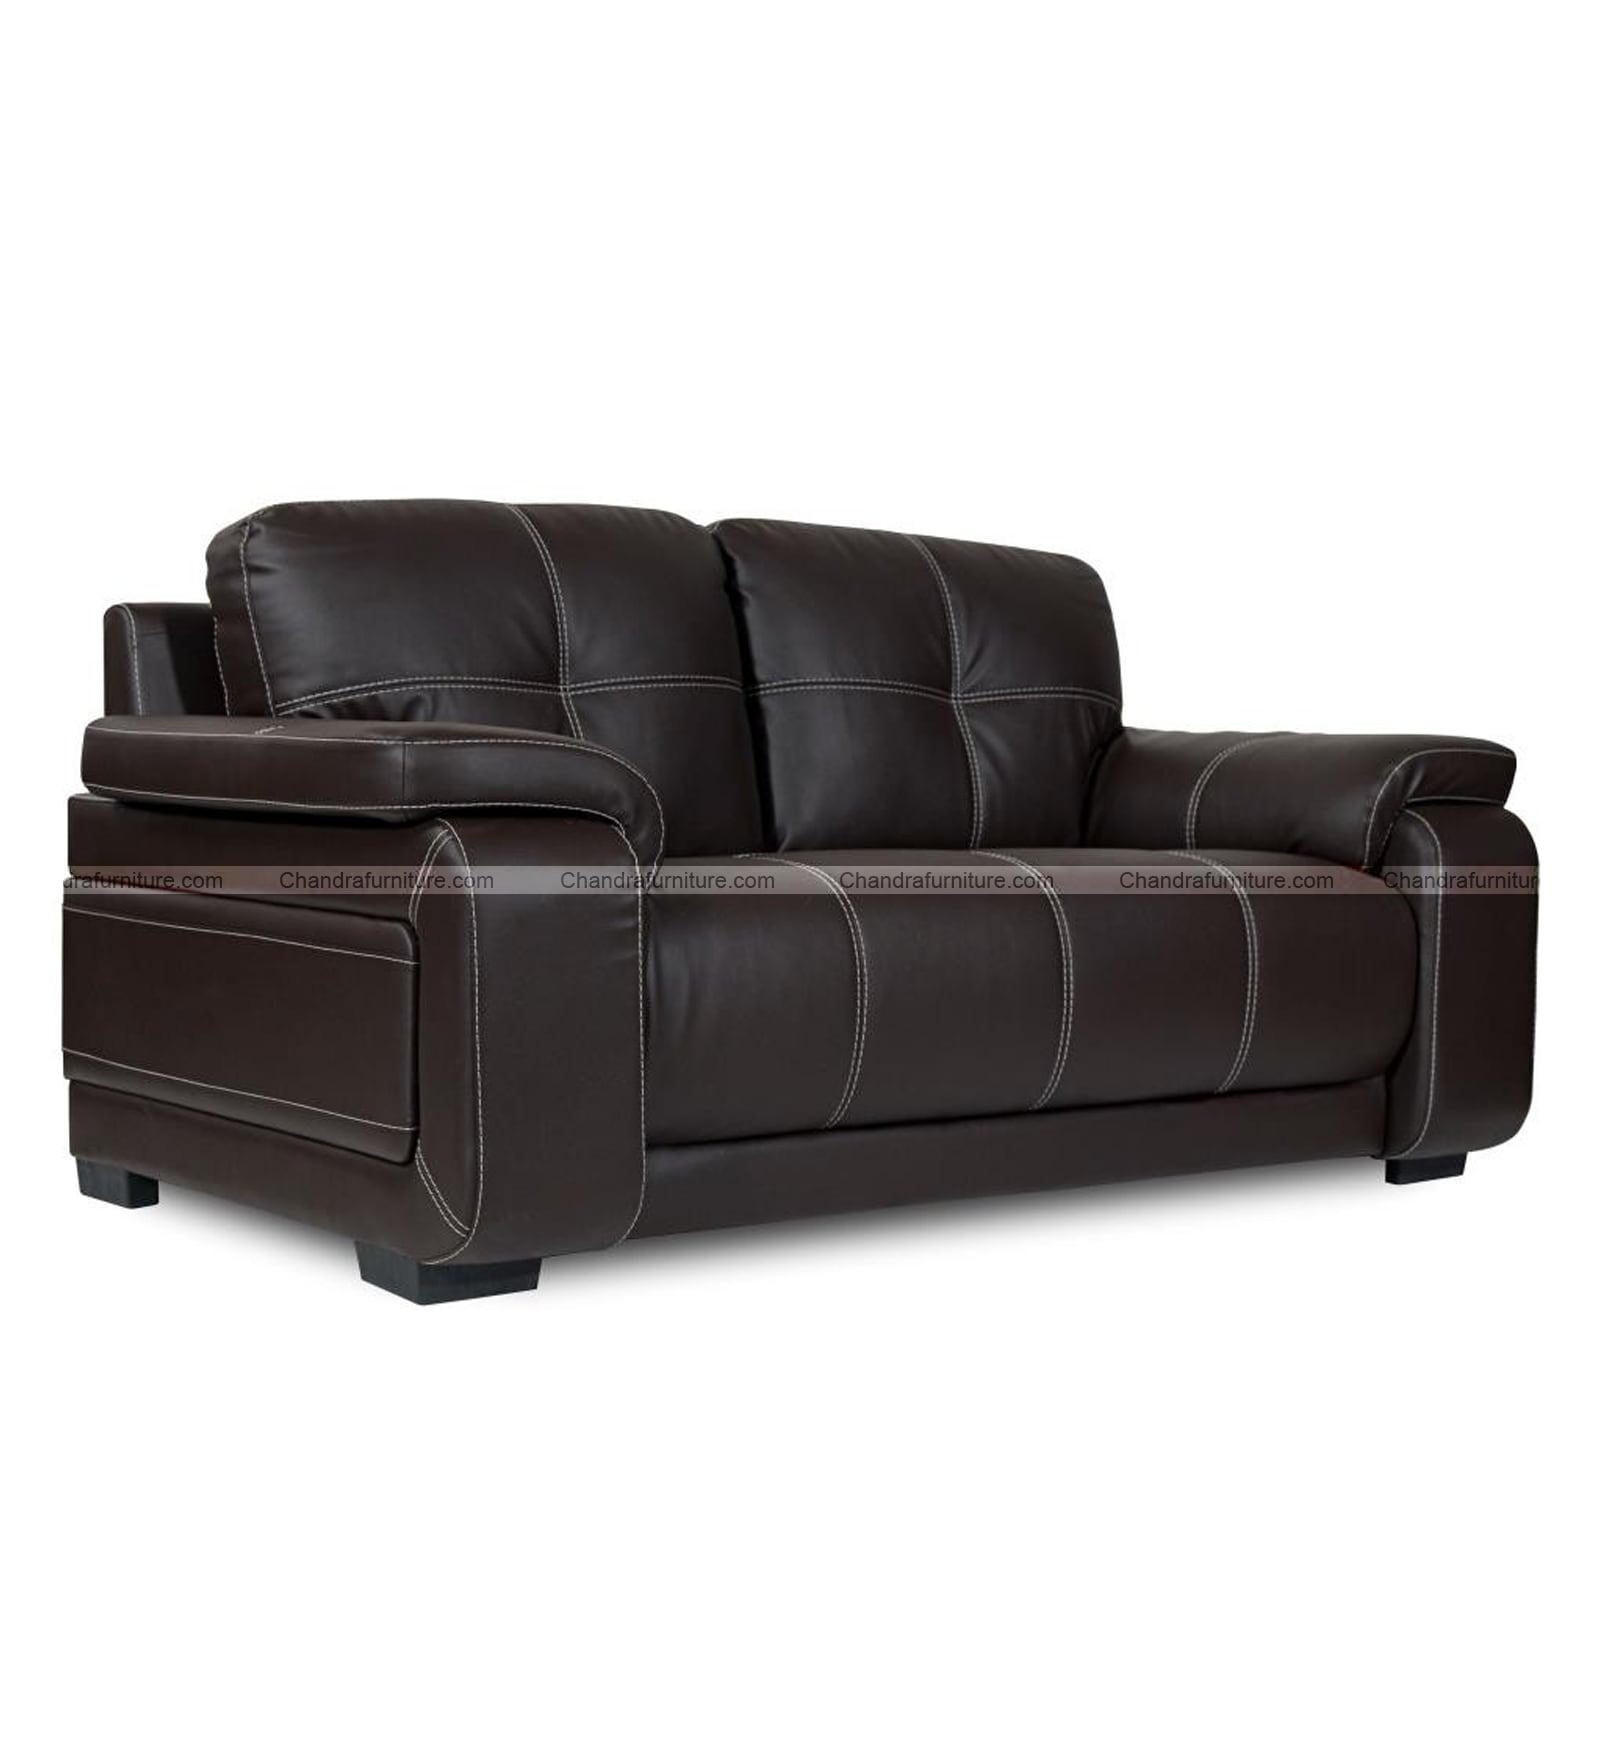 Chandra Furniture Regal Sofa Set In Dark Colour Lathrite